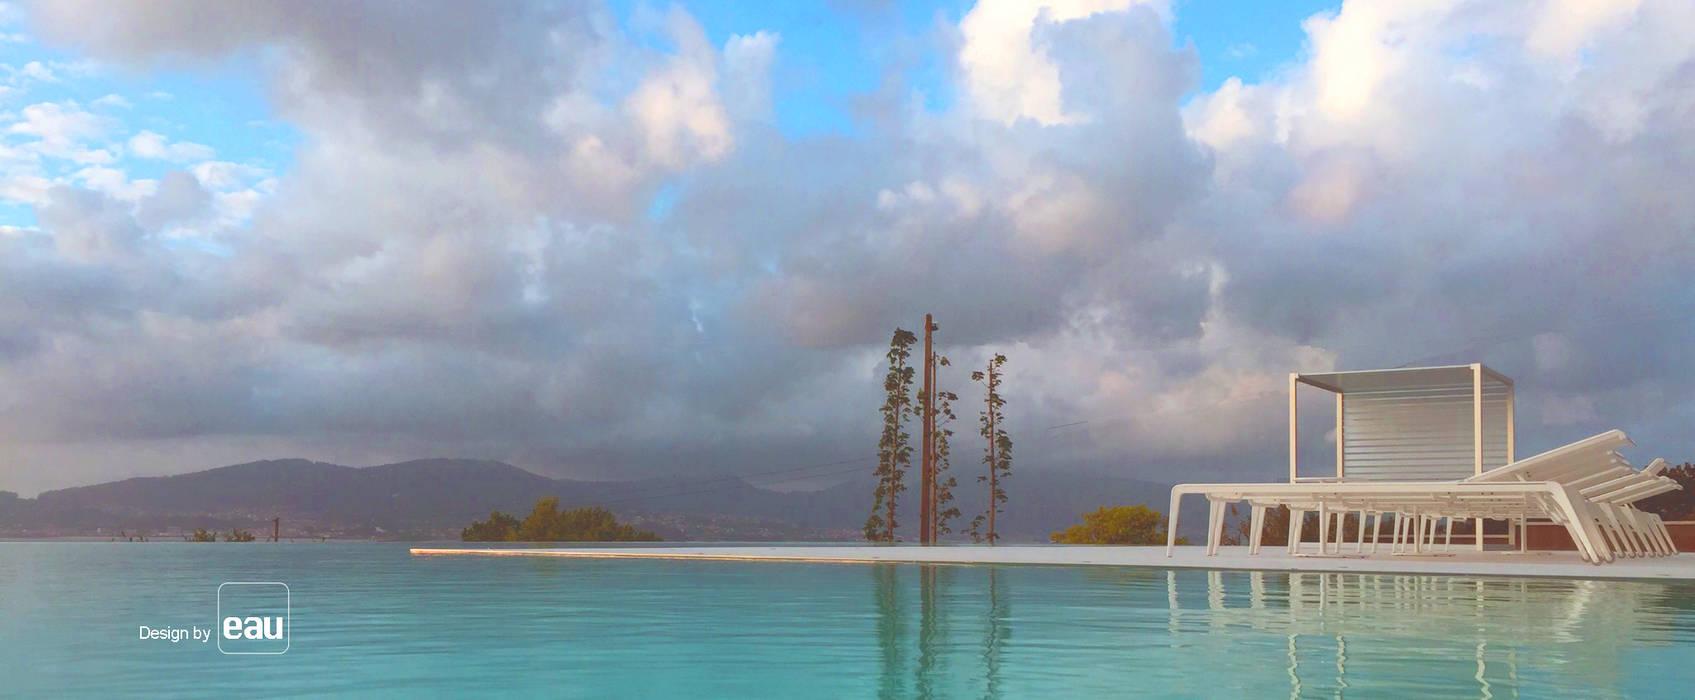 Casa alcabre piscinas de estilo de eau arquitectura s l p - Eau arquitectura ...